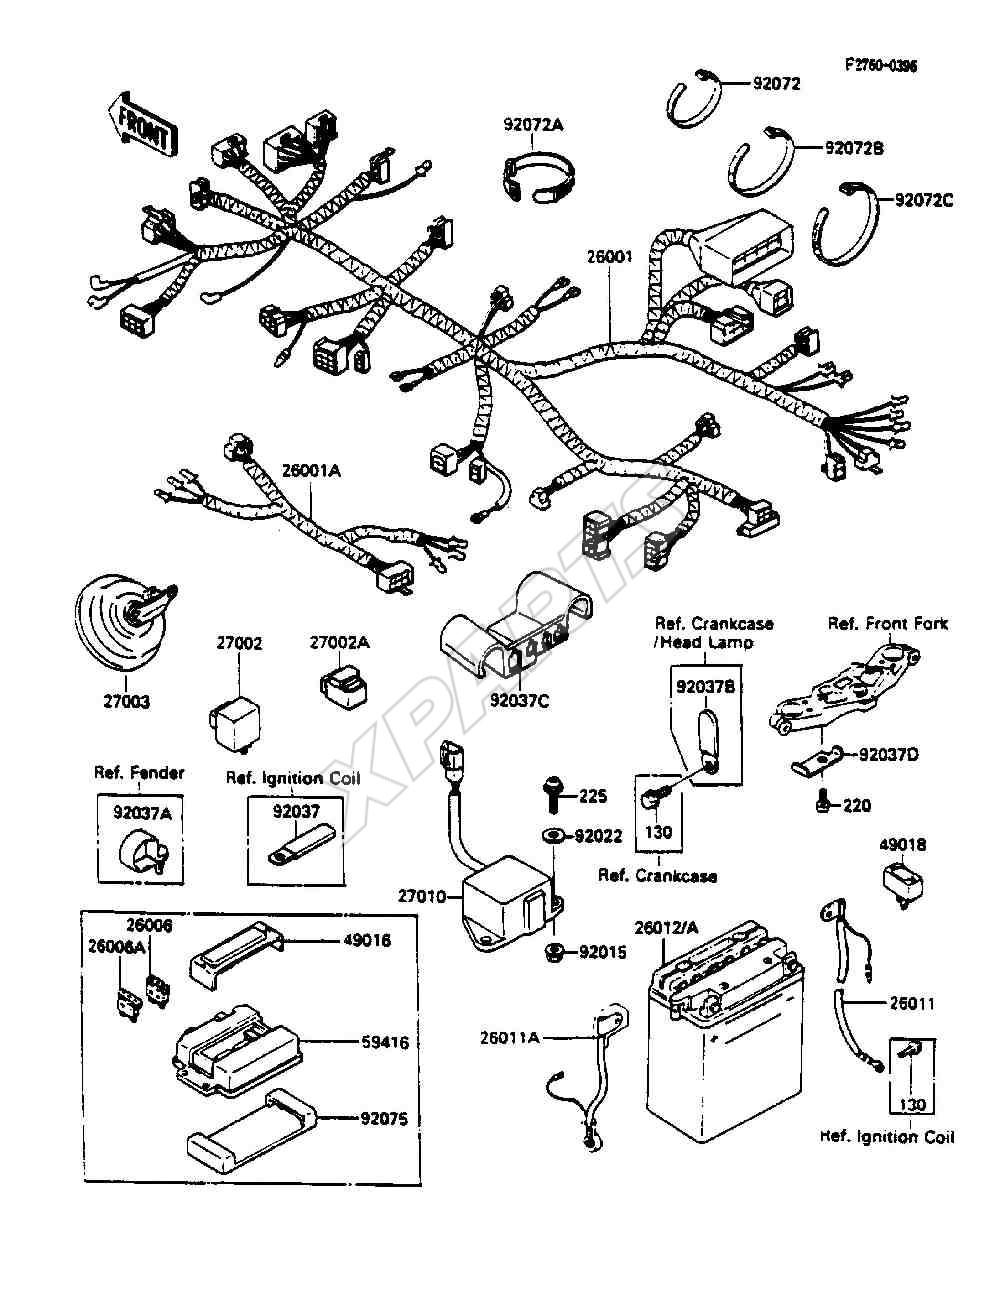 Strange 1989 Zx600 Wiring Diagram Electronic Schematics Collections Wiring 101 Cranwise Assnl